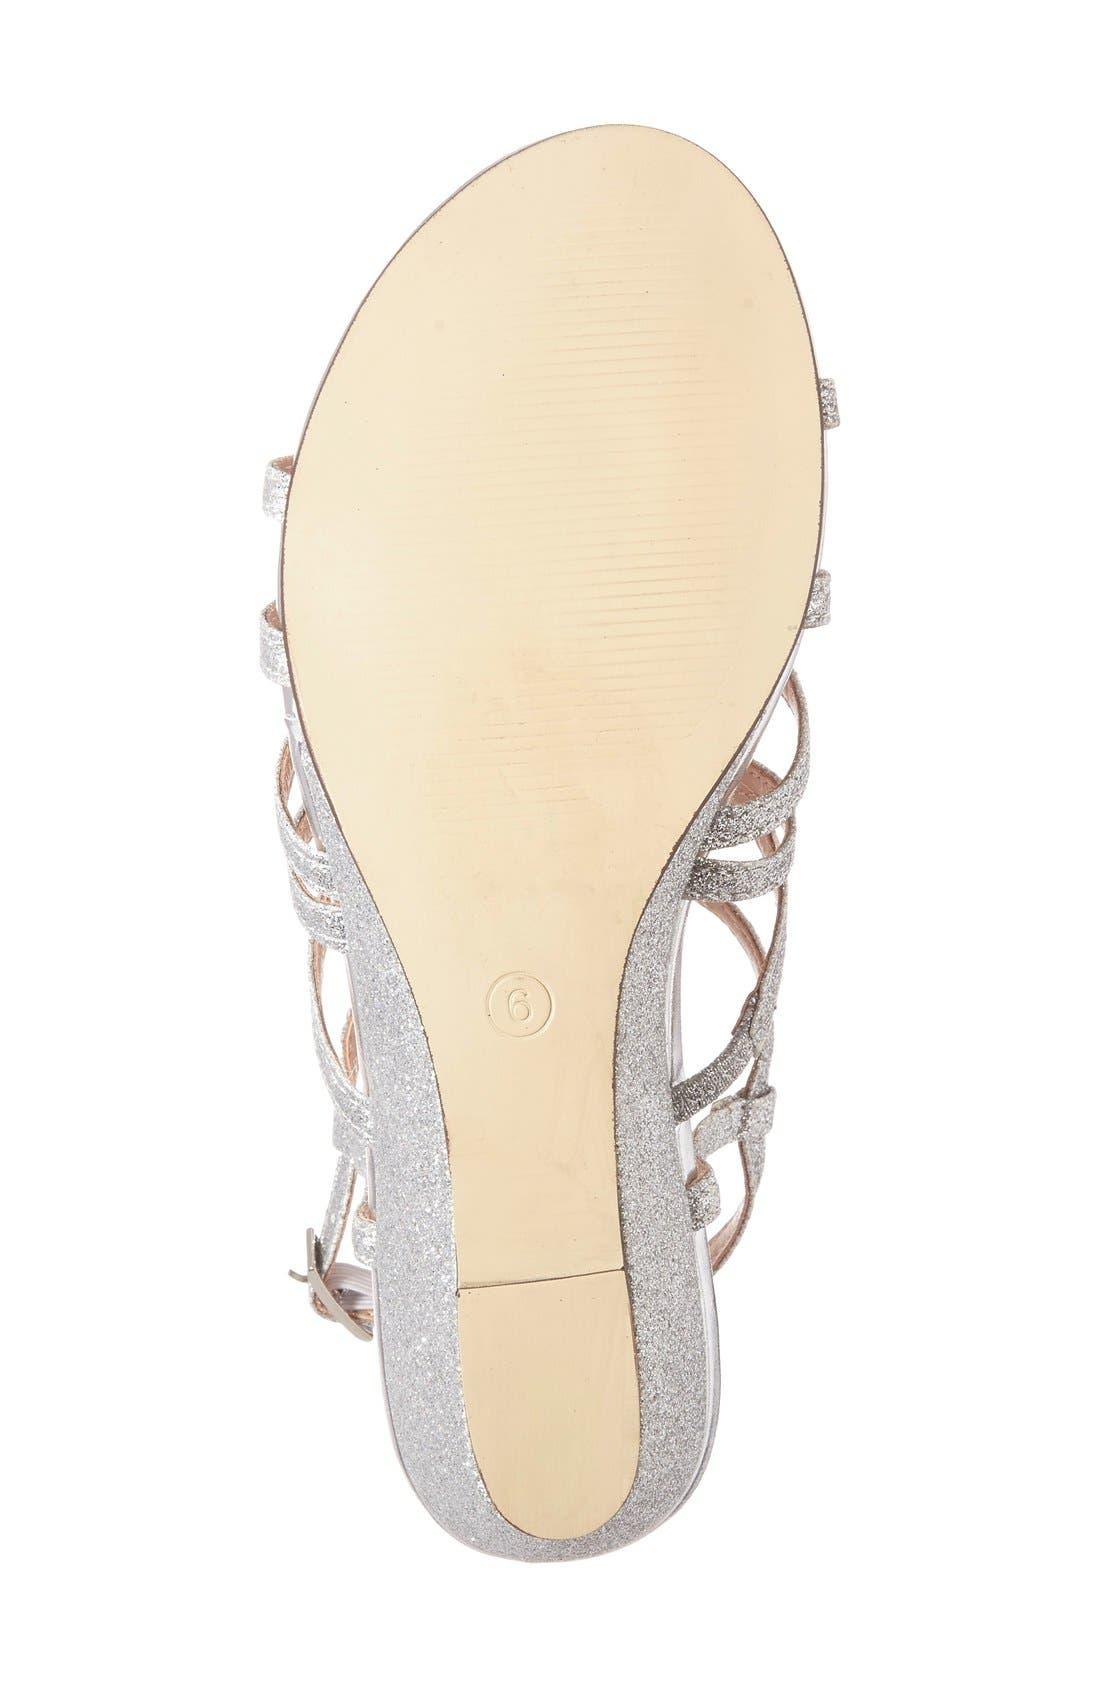 'Opulent' Wedge Sandal,                             Alternate thumbnail 4, color,                             040